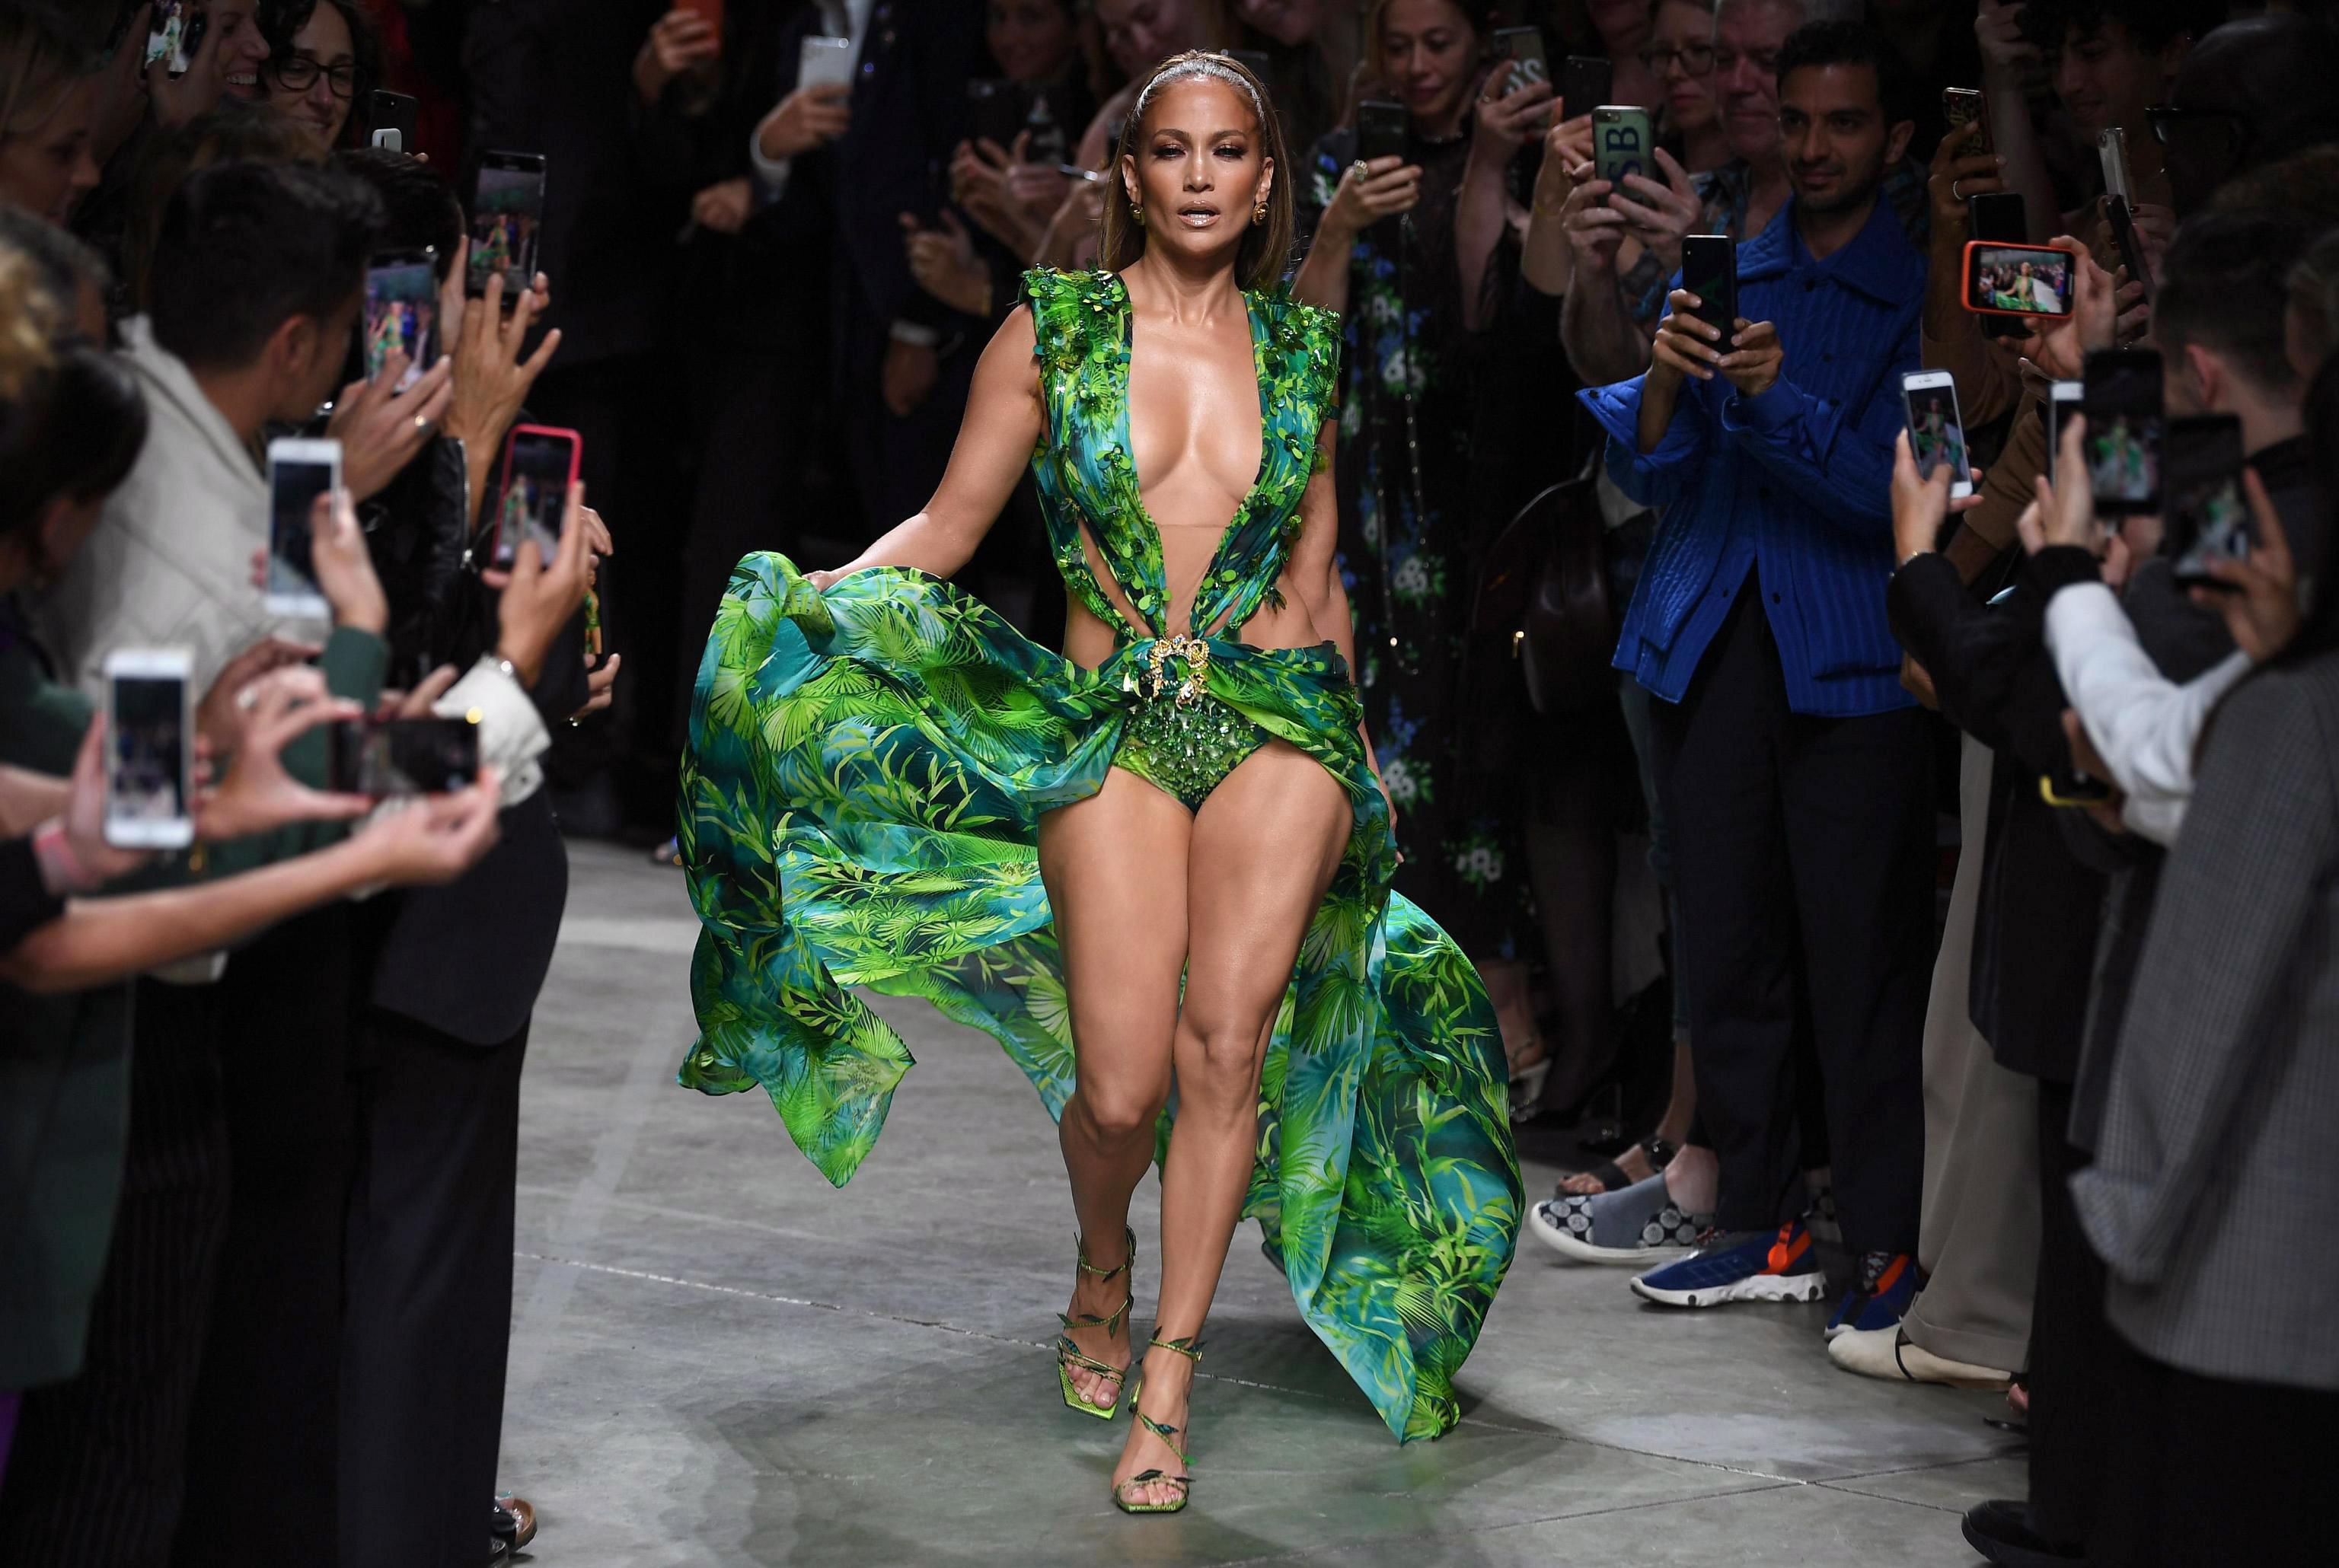 Thời trang thảm đỏ Jennifer Lopez 2020